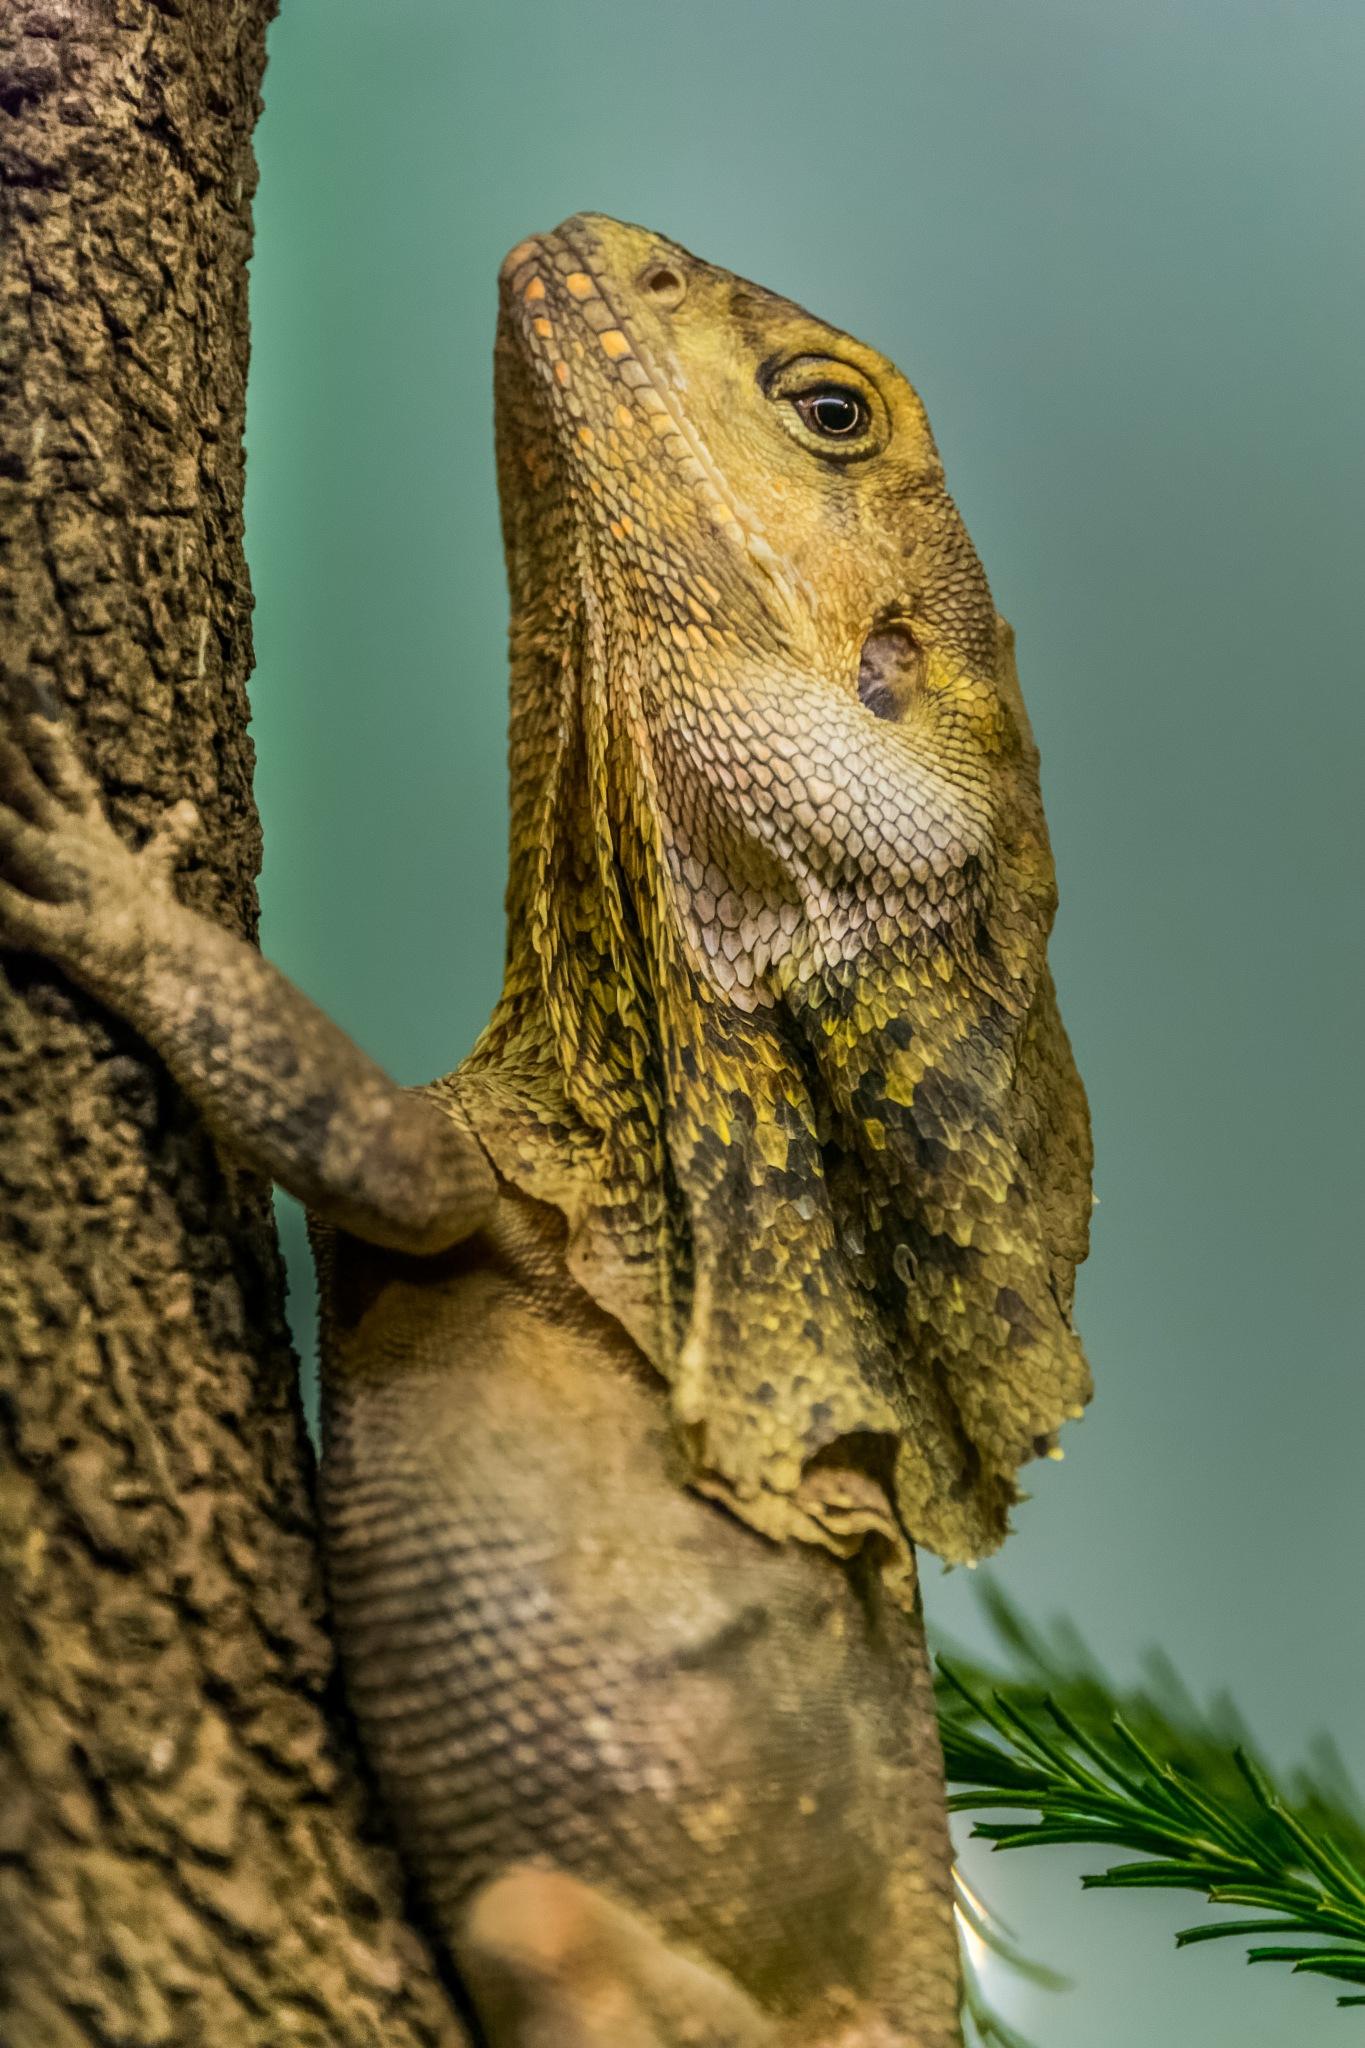 Frilled Dragon by Spiros Miaris